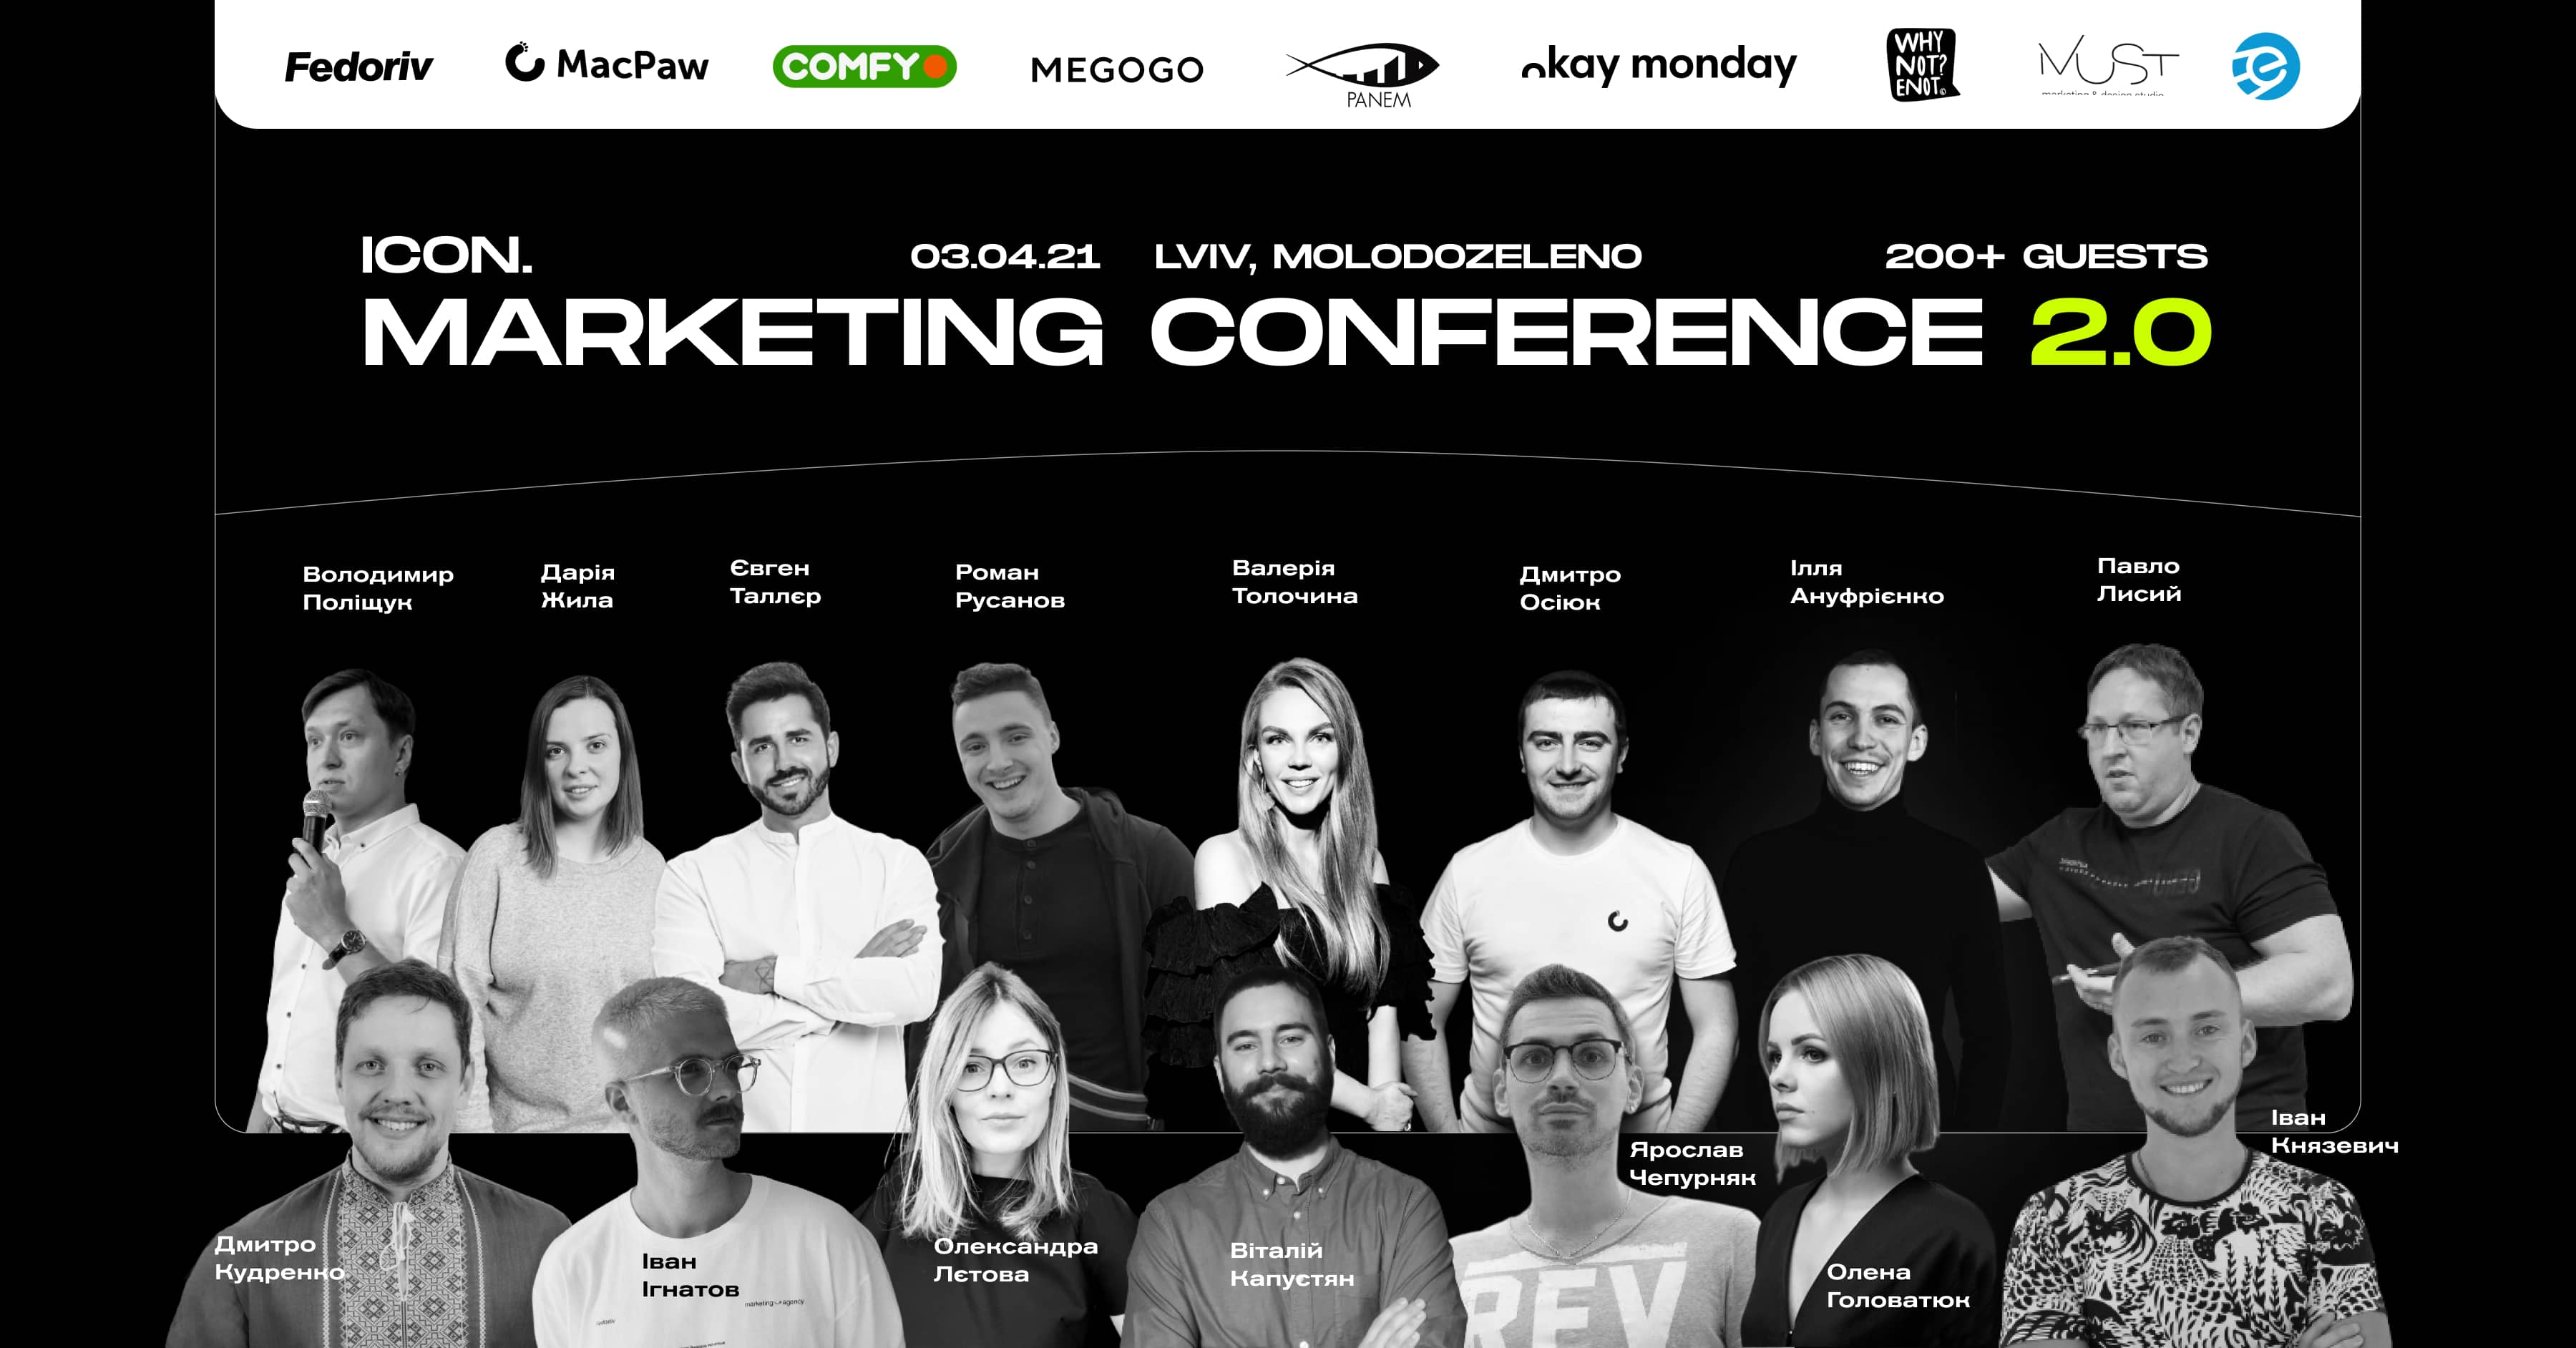 ICON Marketing